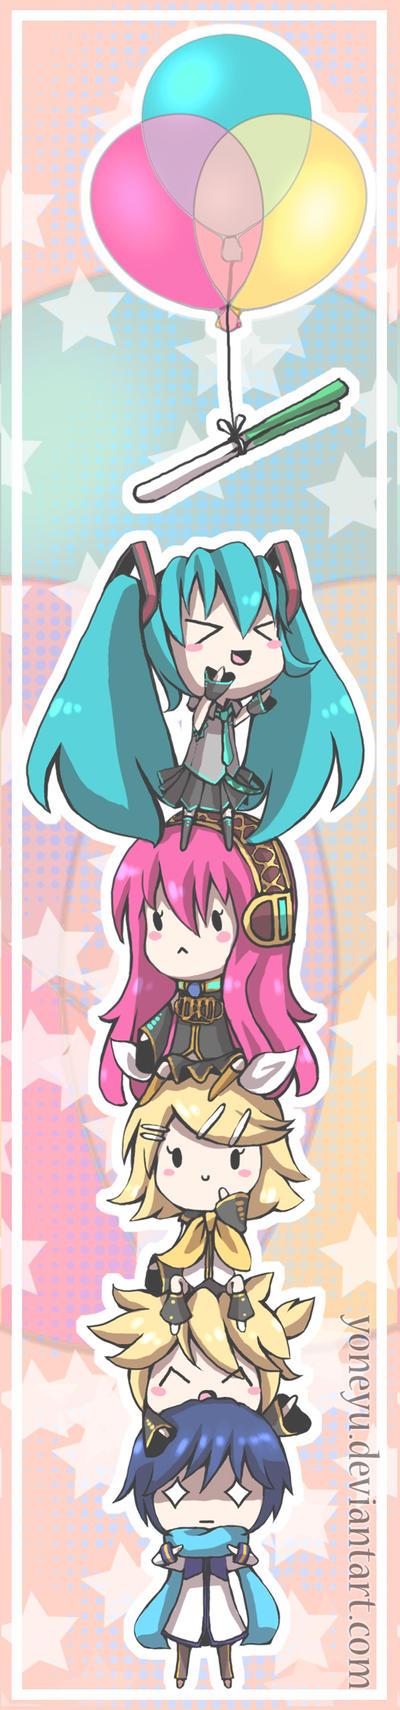 .:Vocaloid Bookmark:. by yoneyu